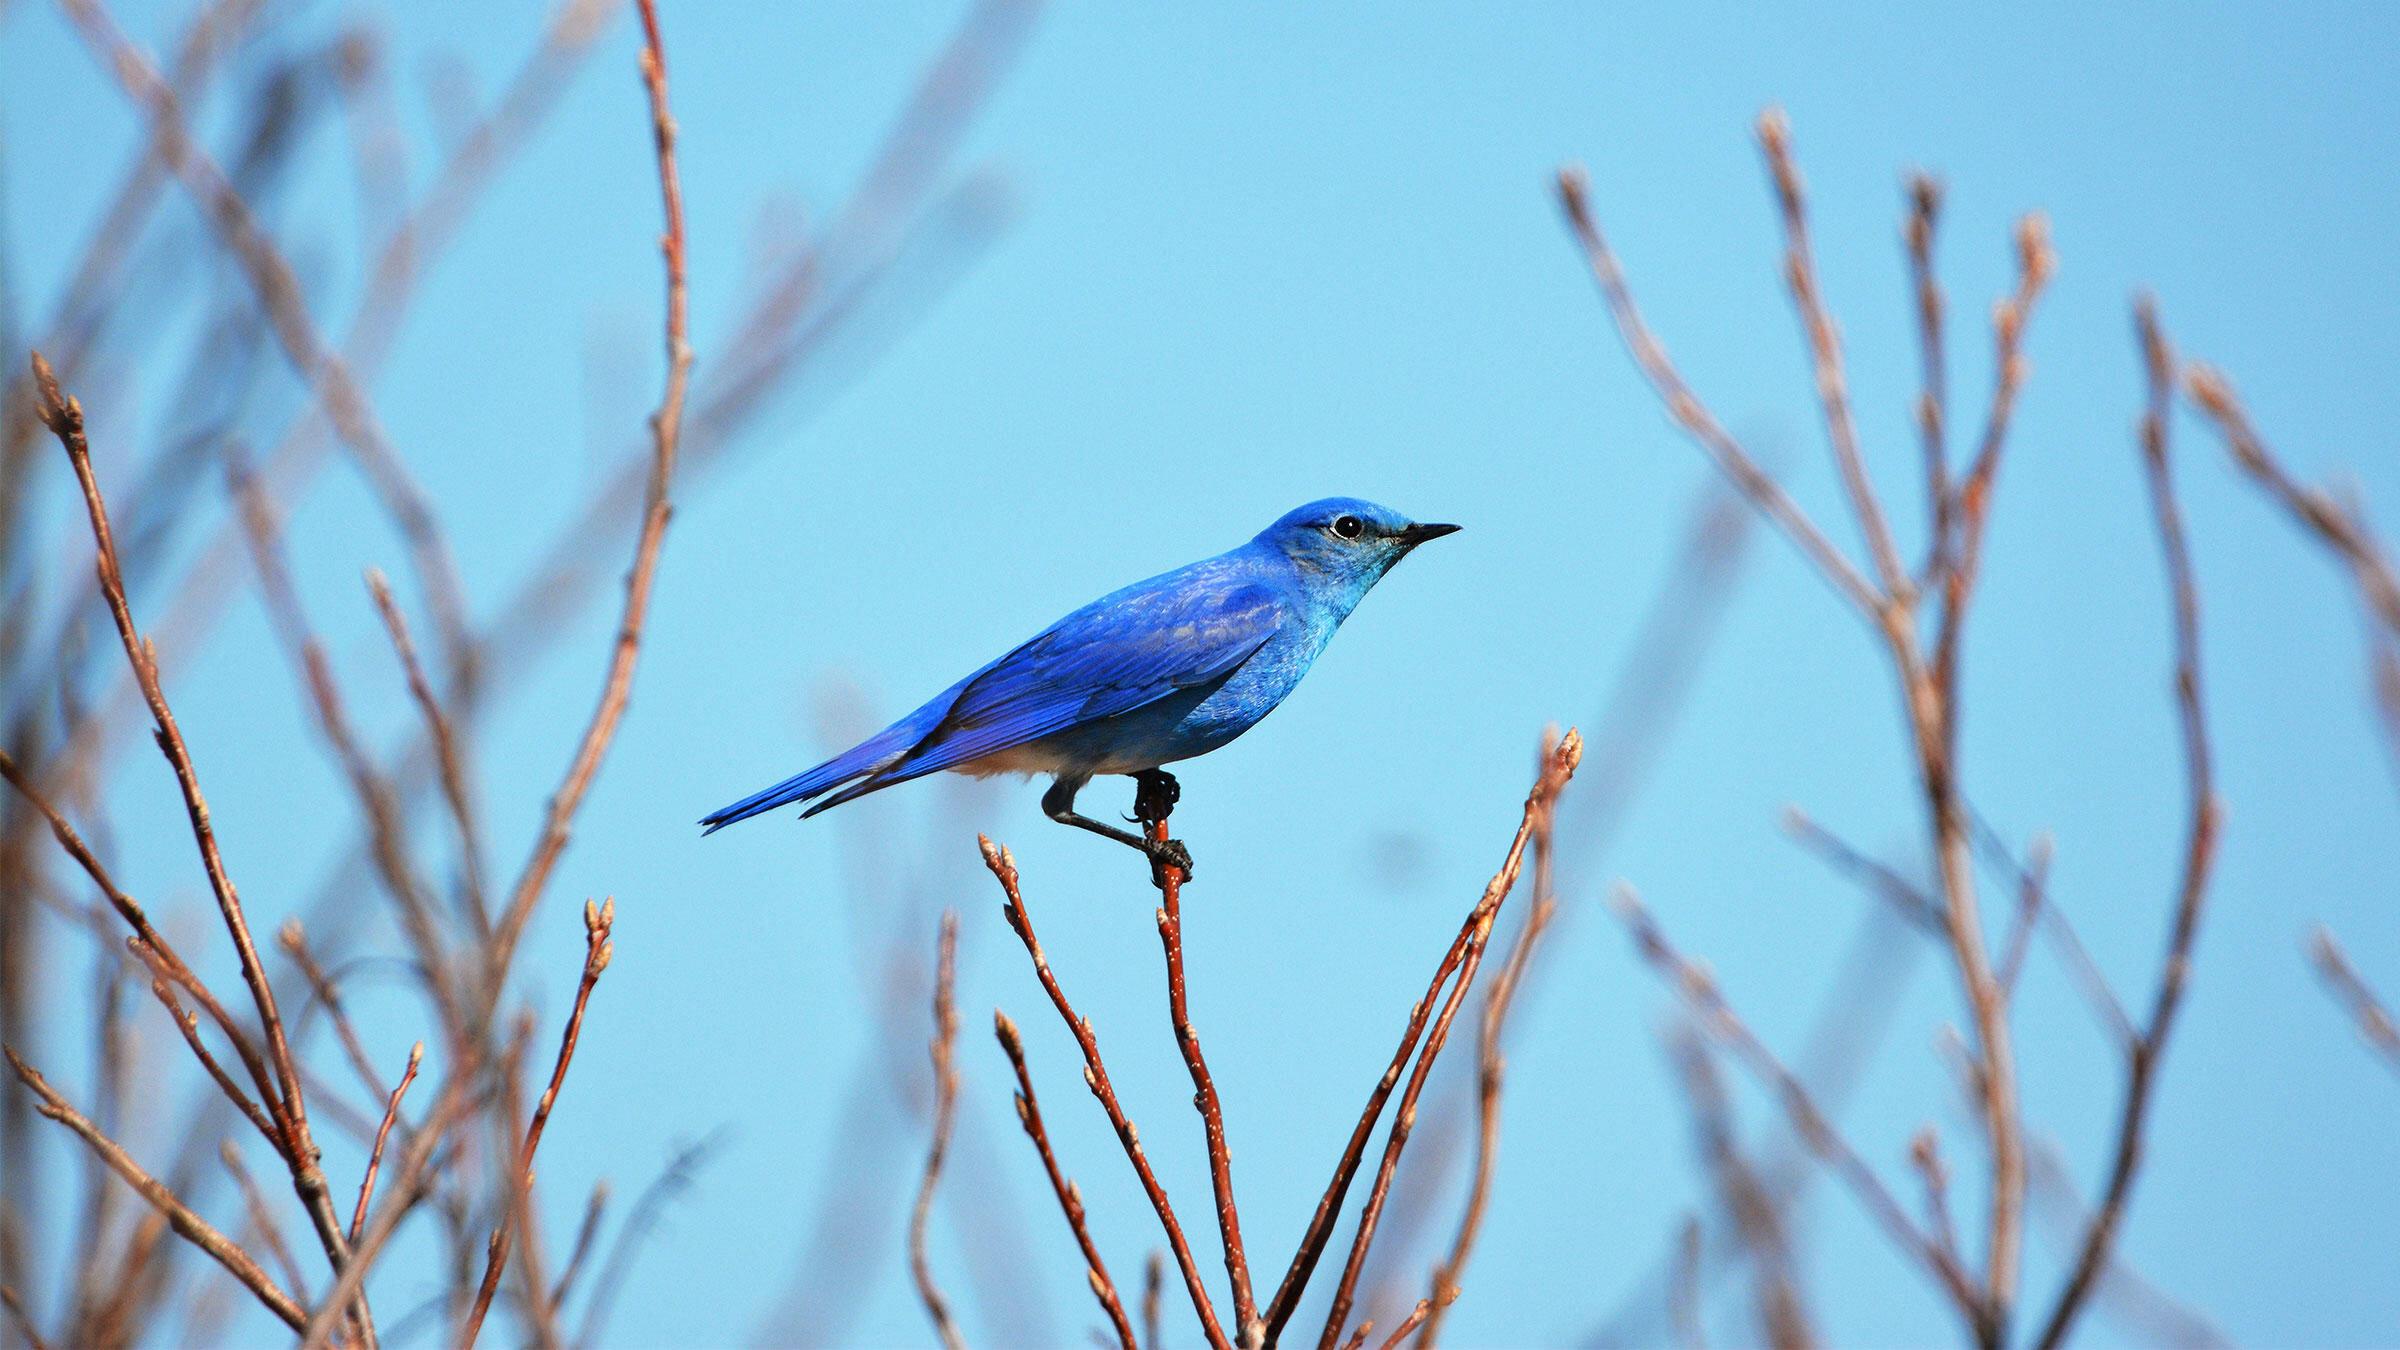 Mountain Bluebird. Diane Taylor/Audubon Photography Awards